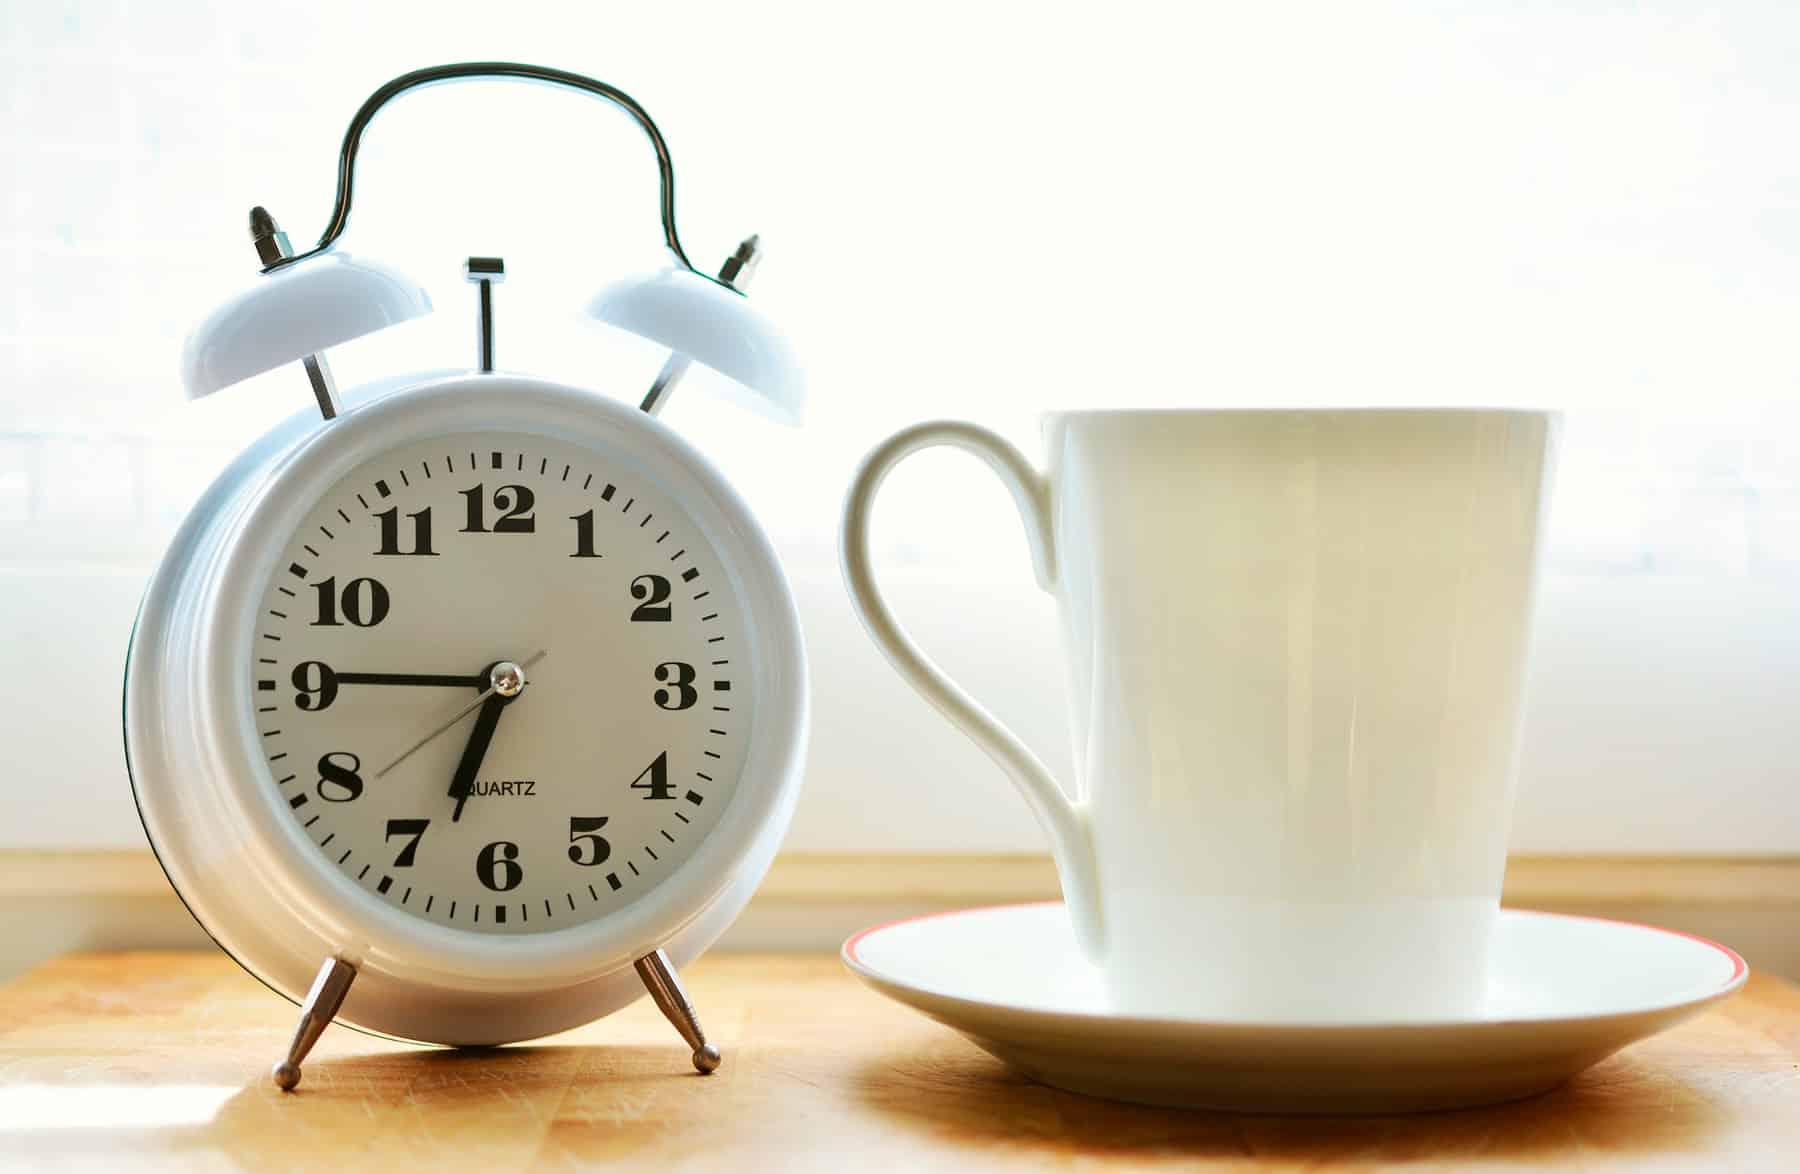 Dieta del Ayuno Intermitente: ¿Es realmente útil?